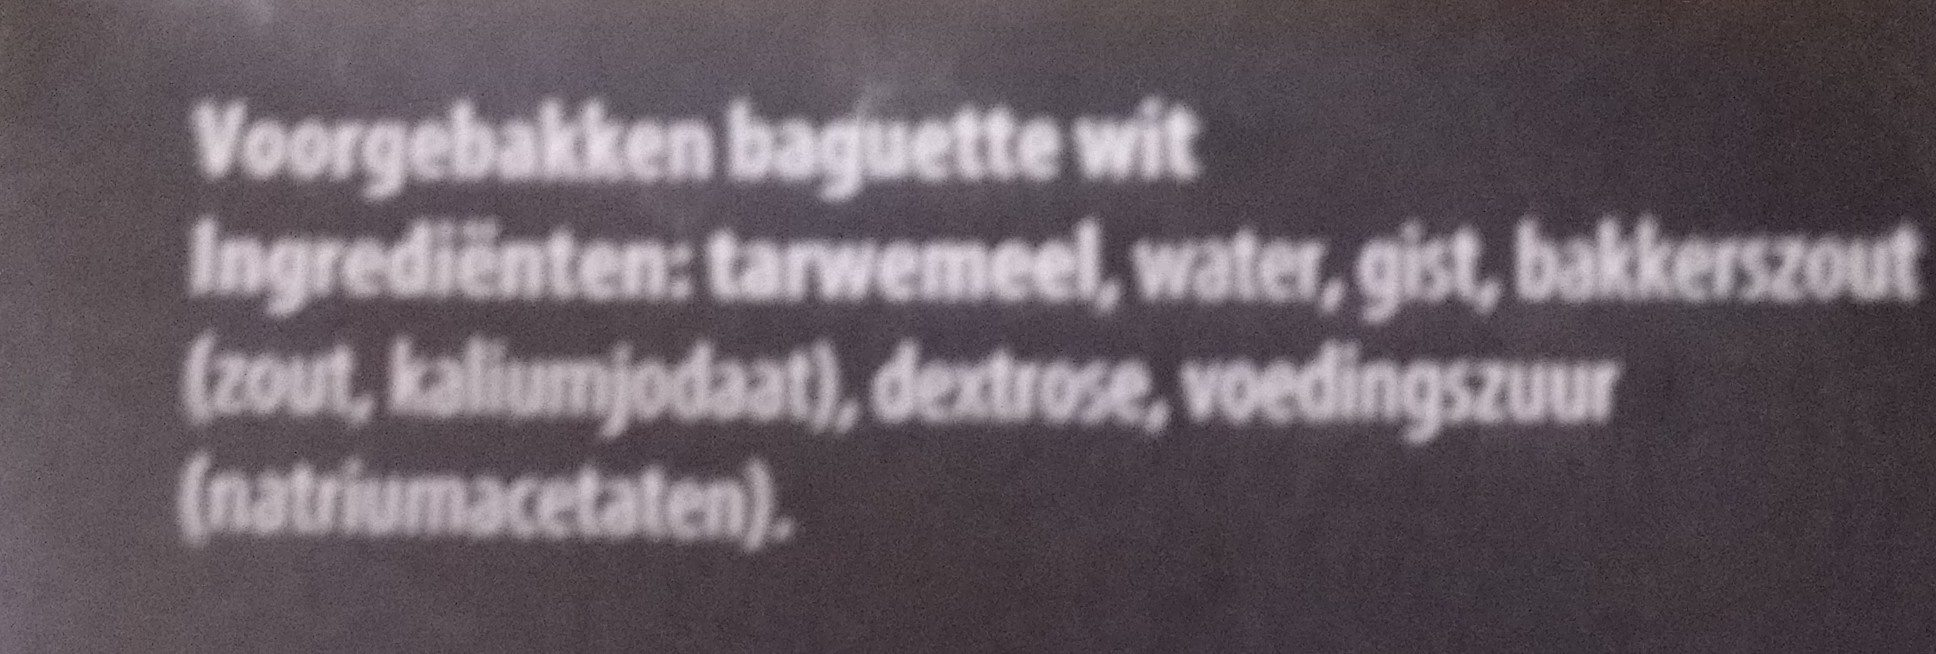 Baguettes Wit - Ingredients - nl